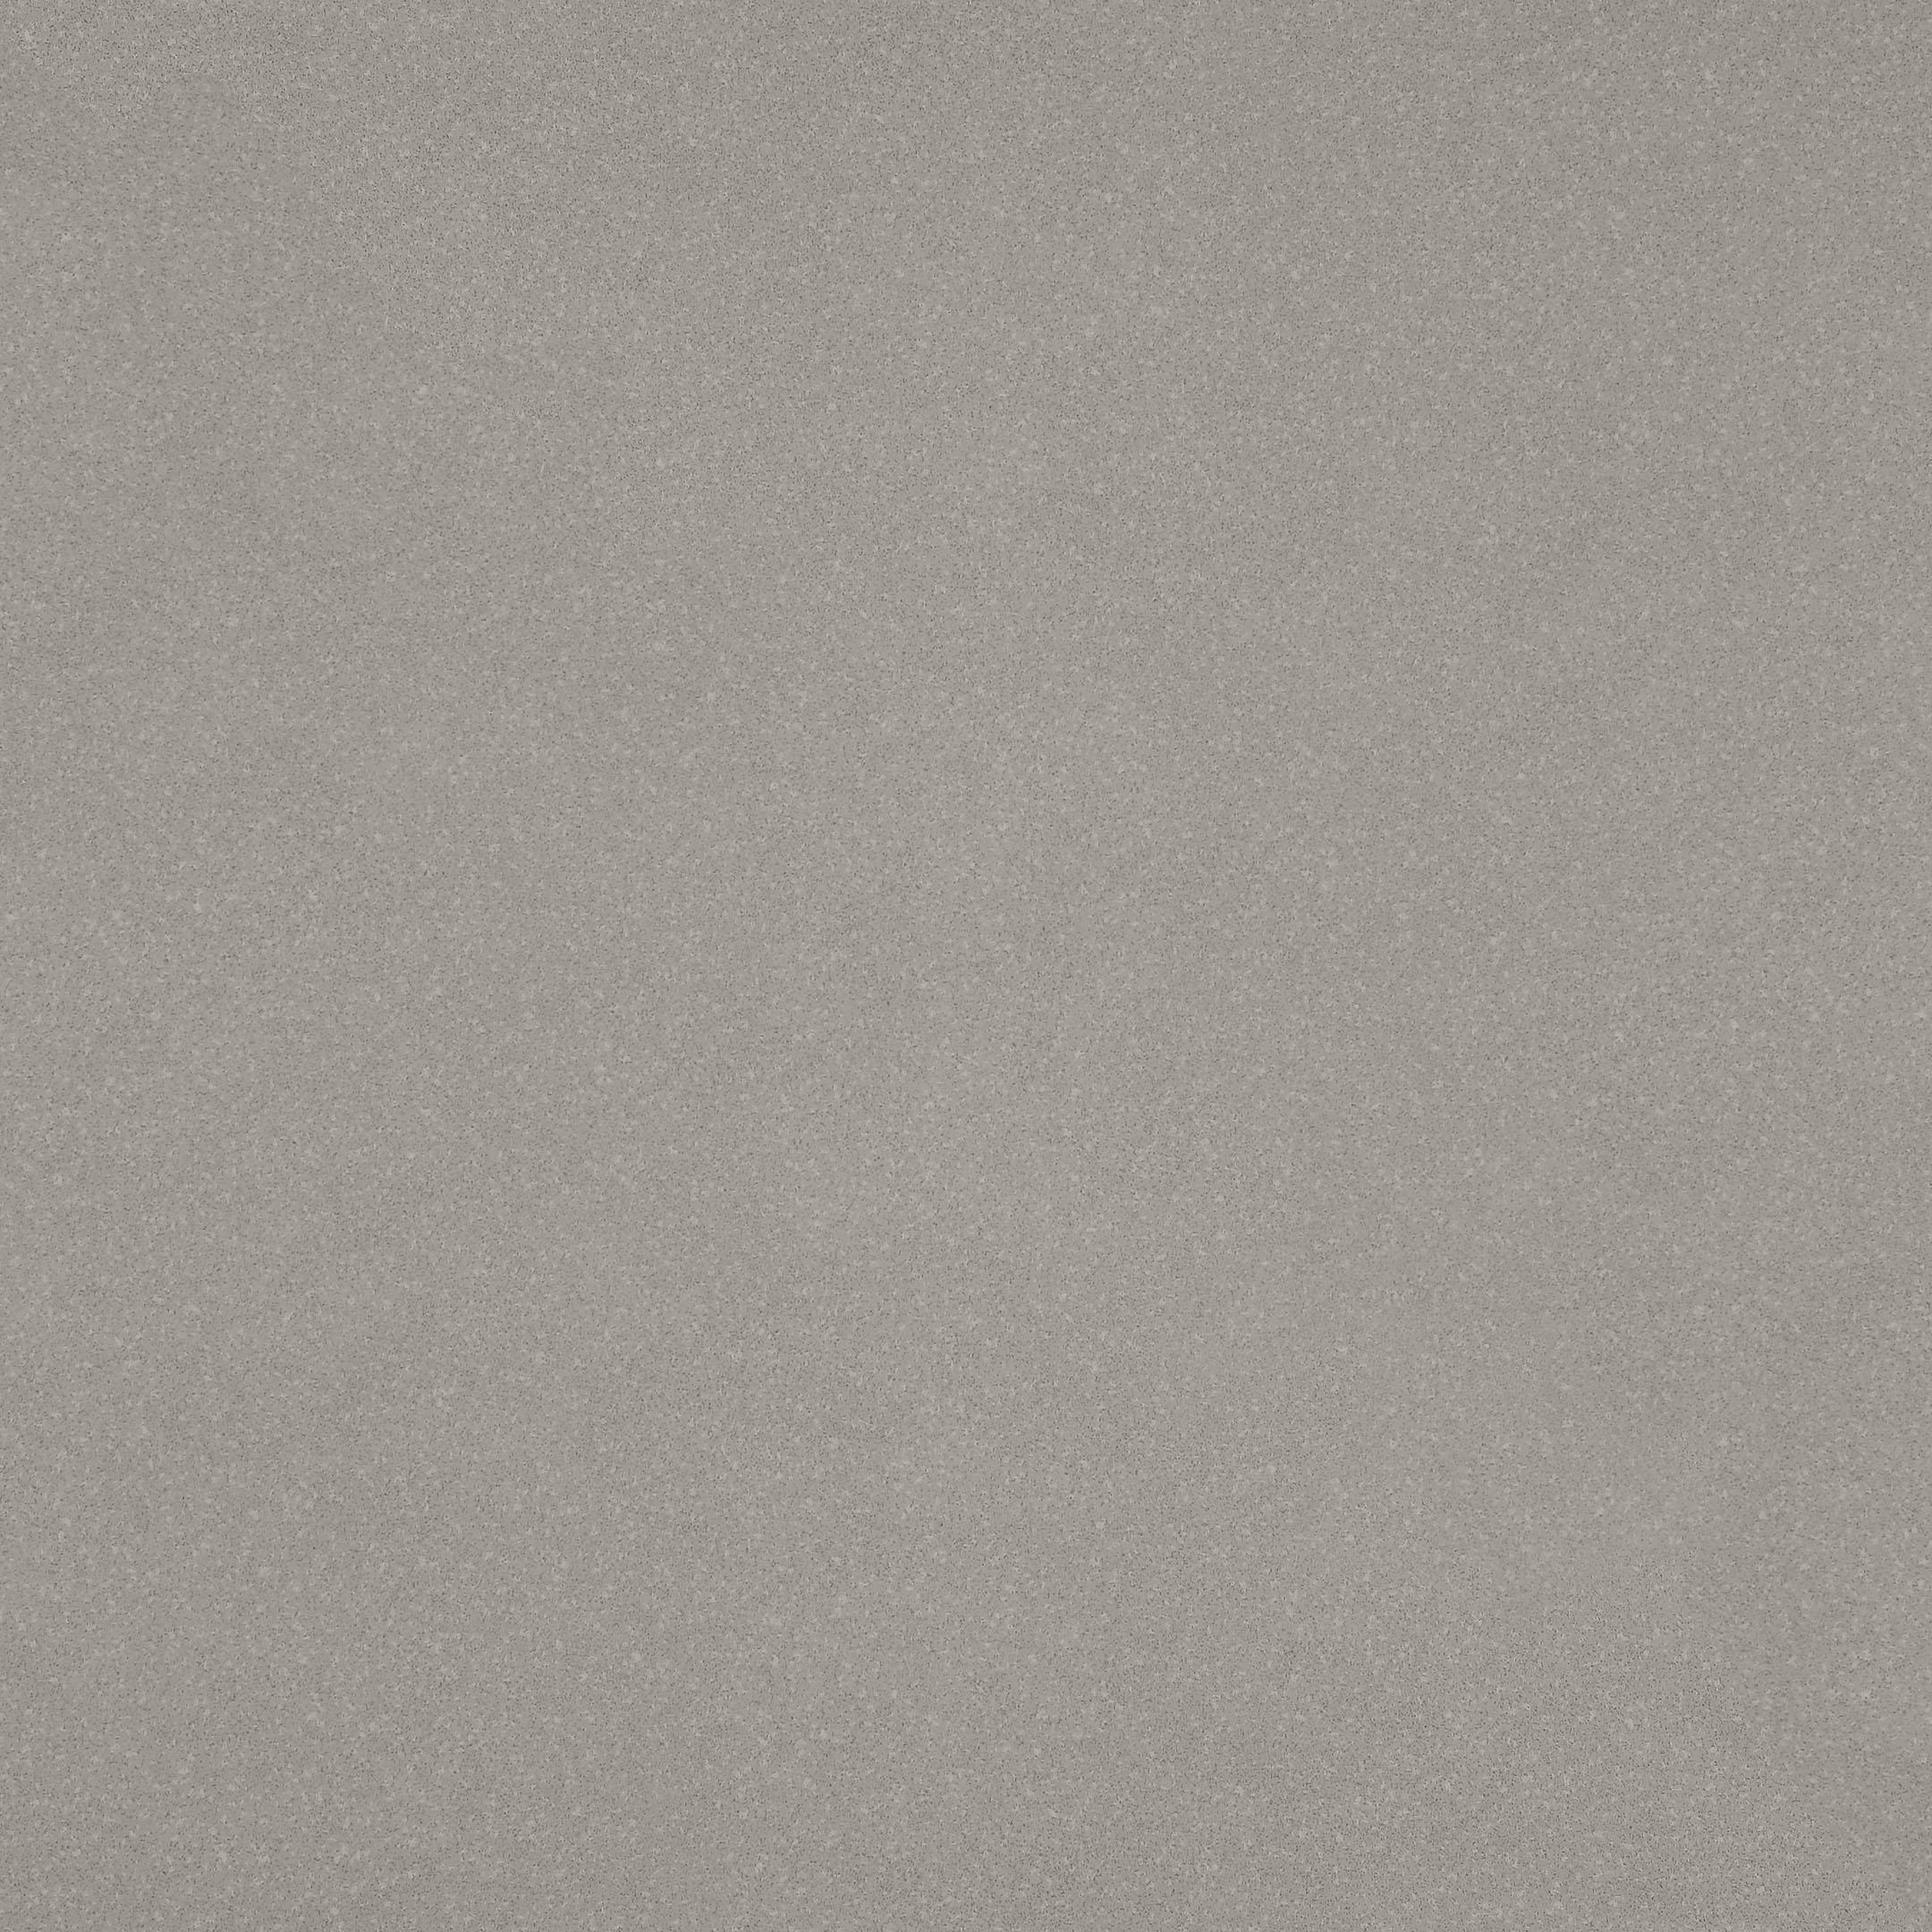 Линолеум Tarkett Acczent Pro ASPECT 2 коммерческий 2,5 м